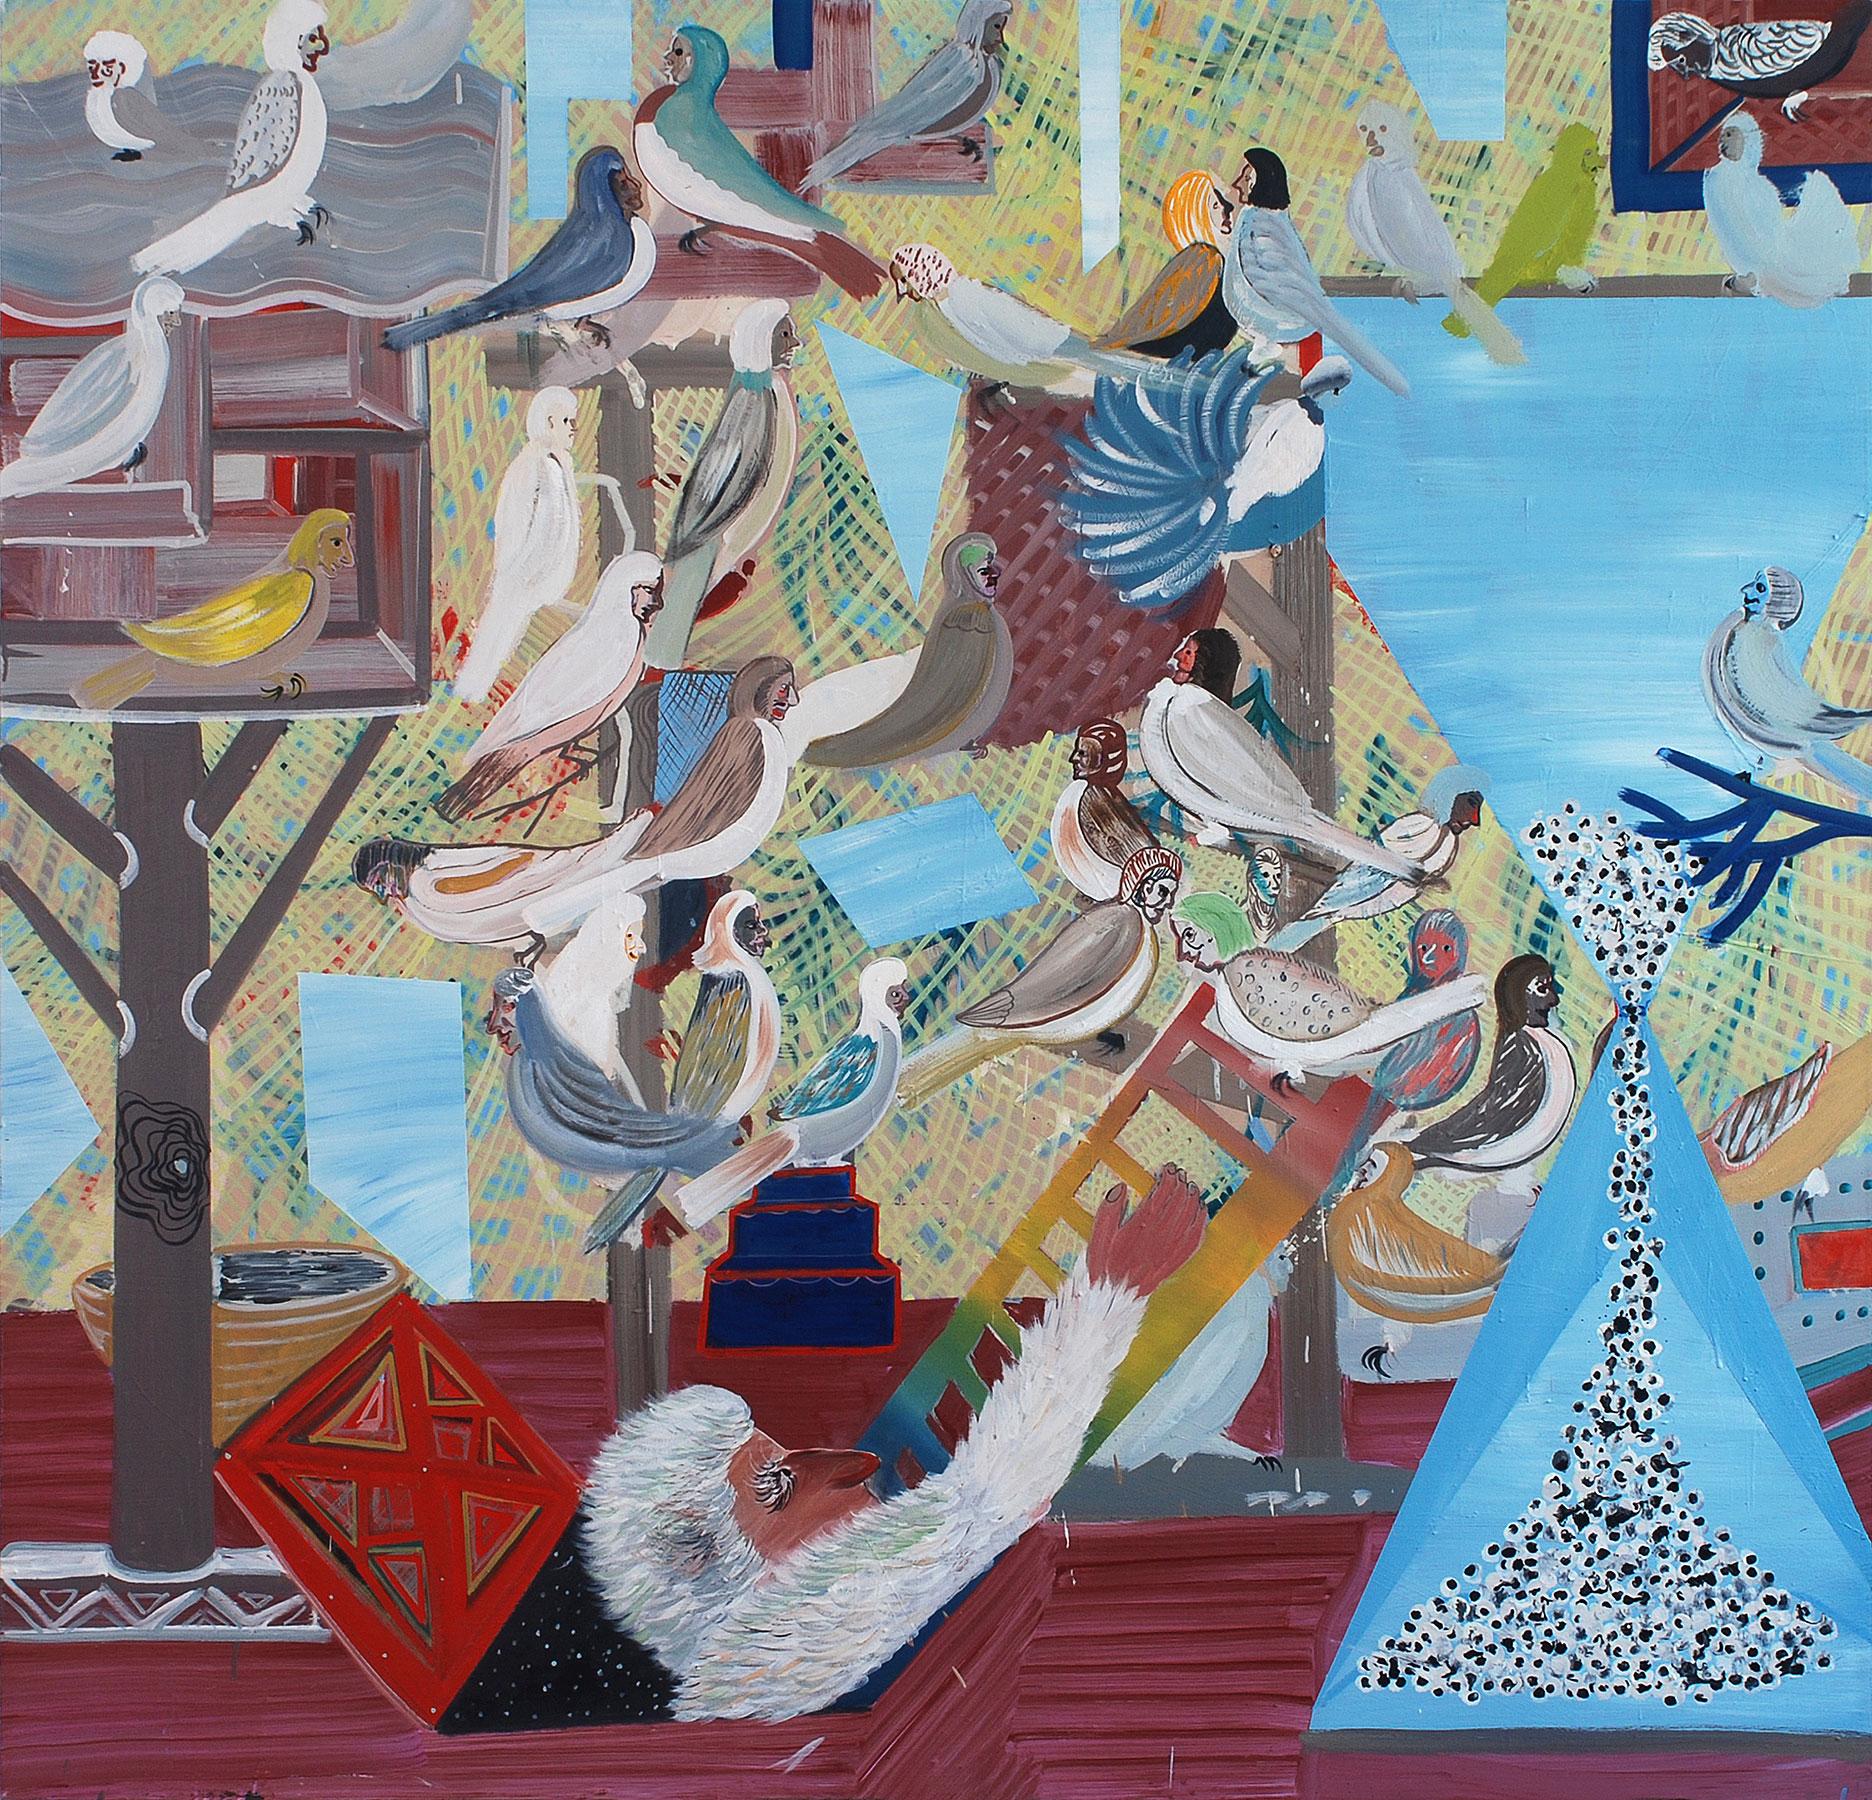 Jacob, 2011    Oil on canvas, 178x181 cm